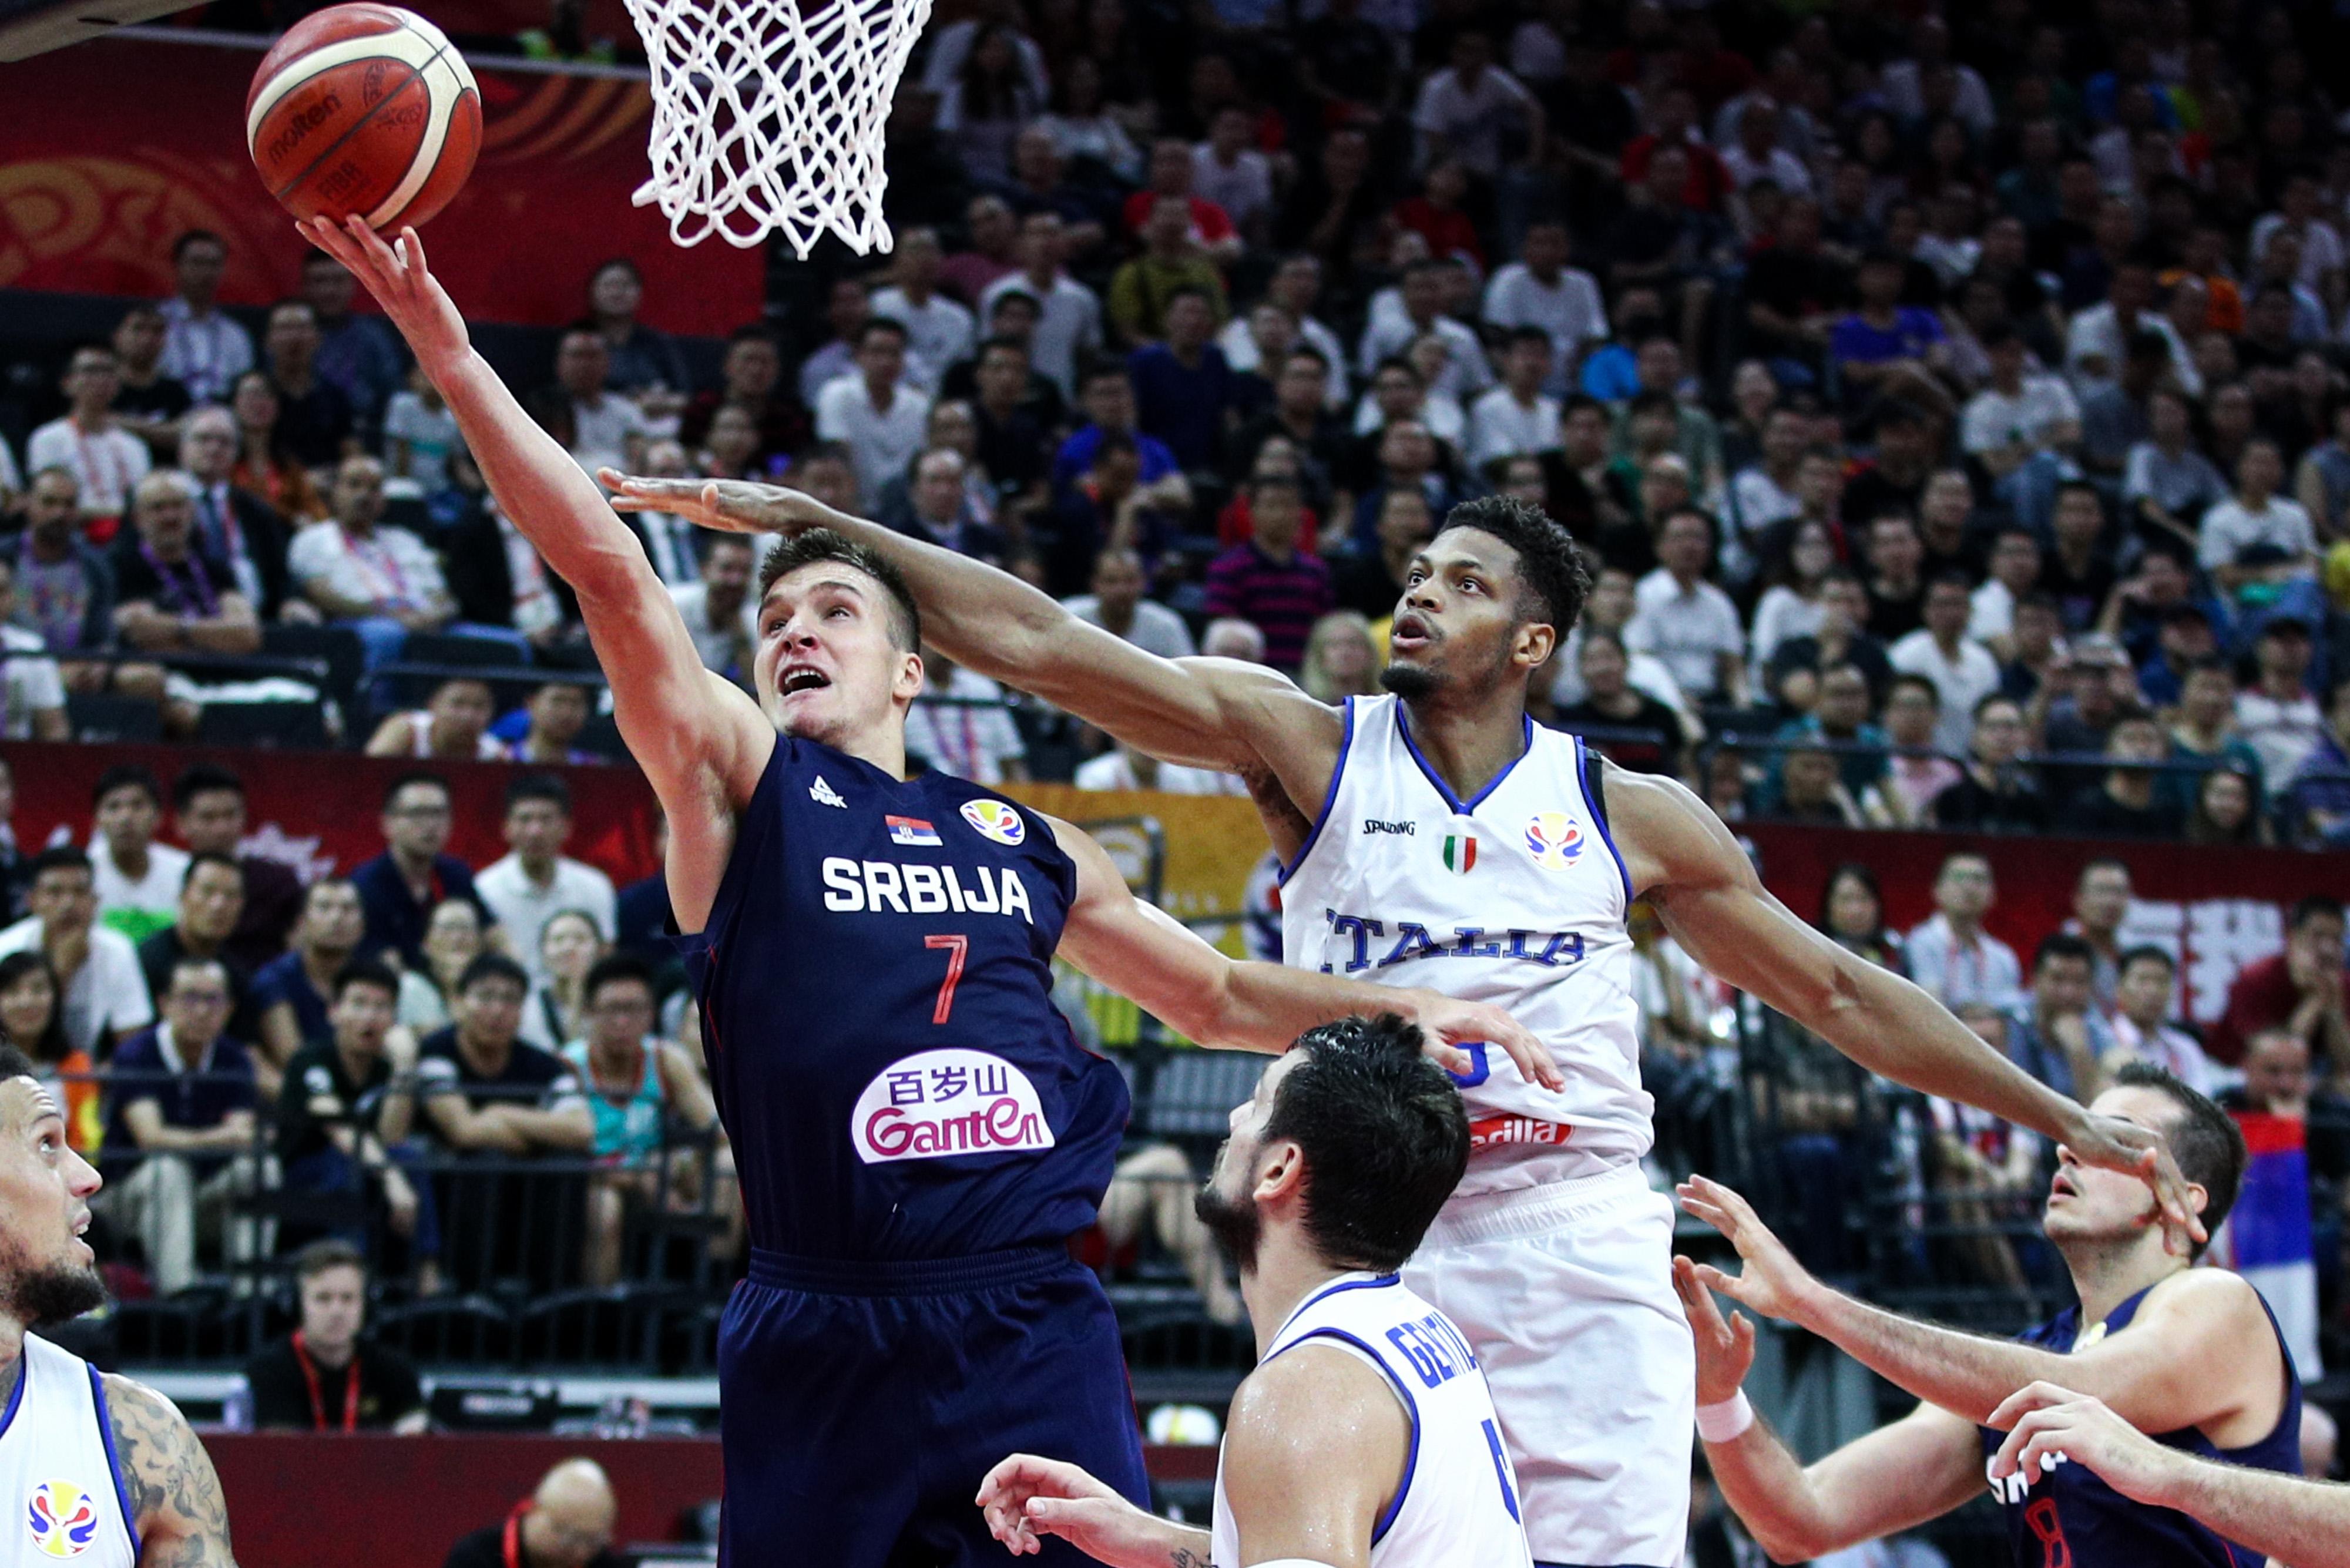 Italy v Serbia: Group D - FIBA World Cup 2019